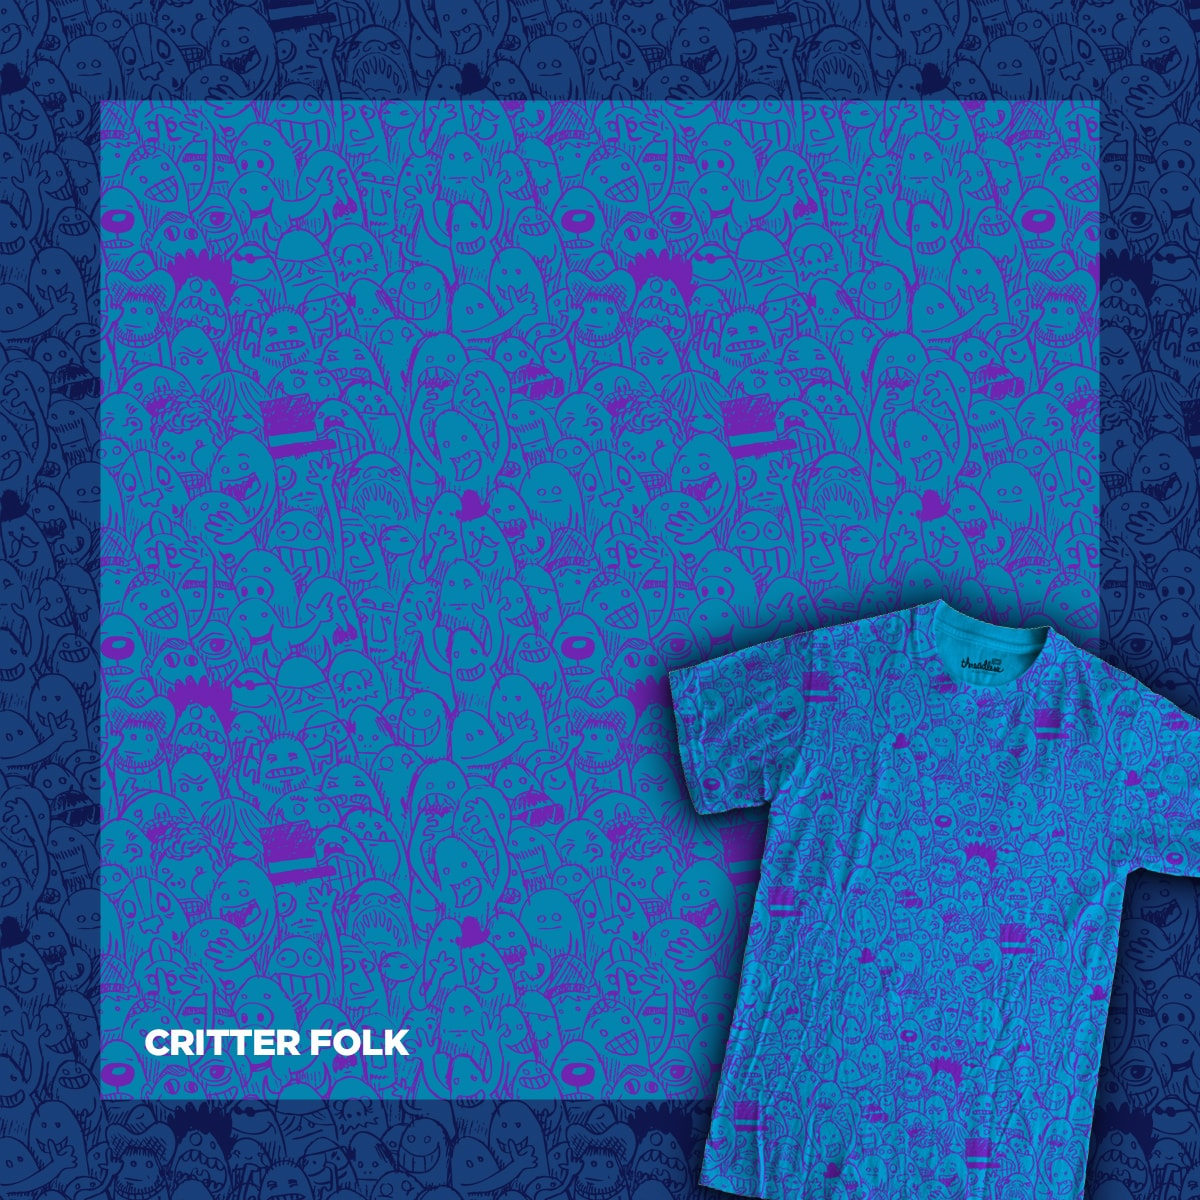 Critter Folk by WanderingBert on Threadless